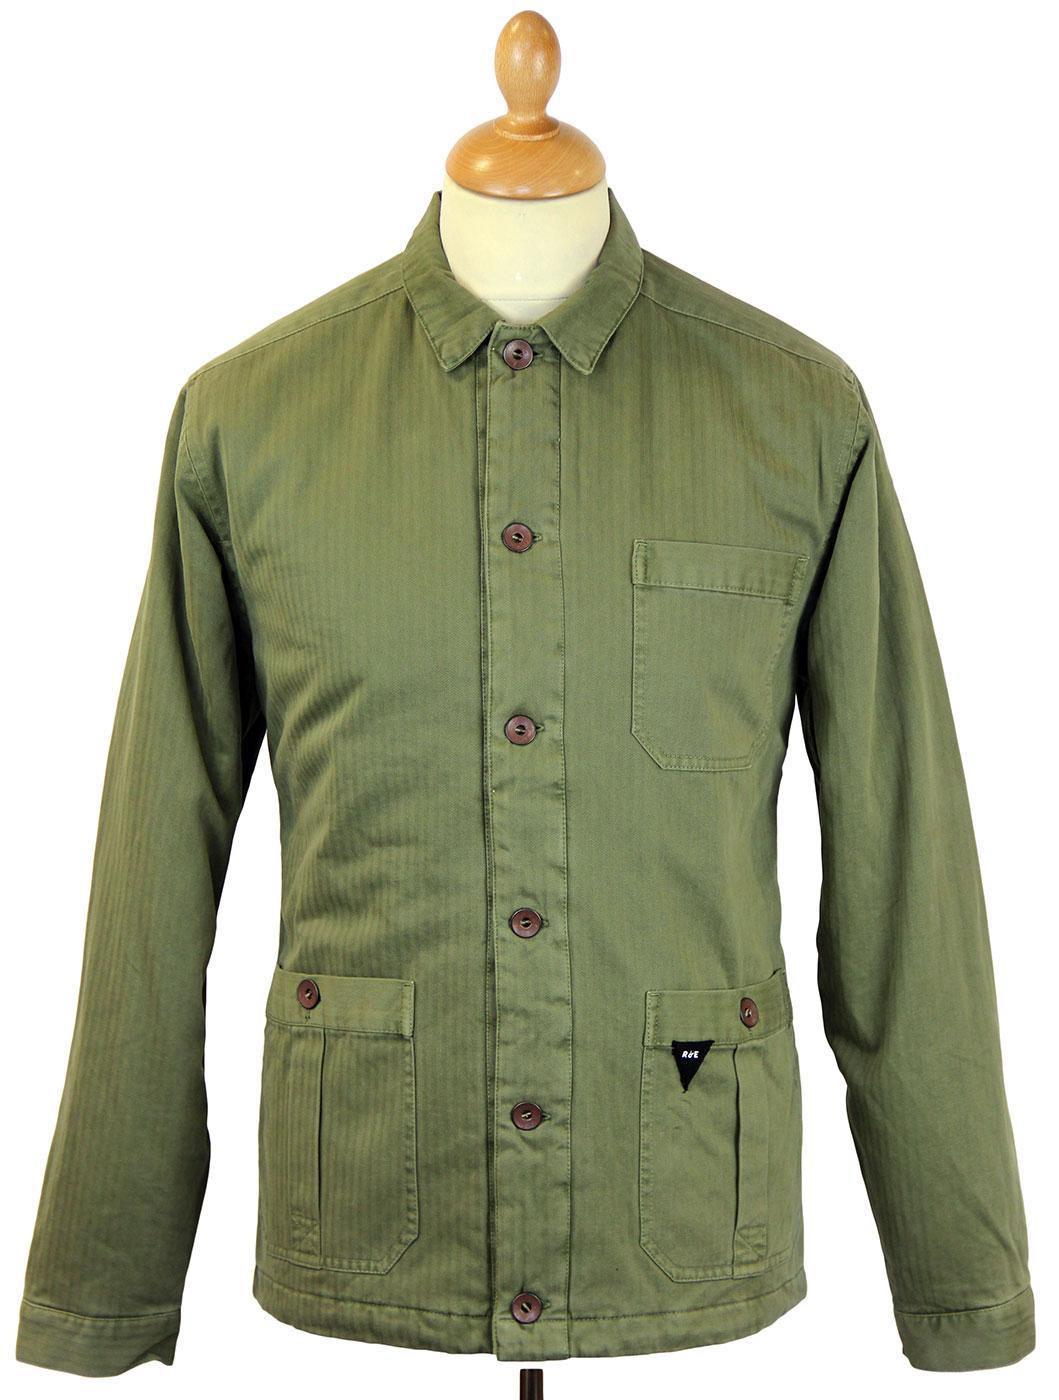 Artisan REALM & EMPIRE Herringbone Quilt Jacket